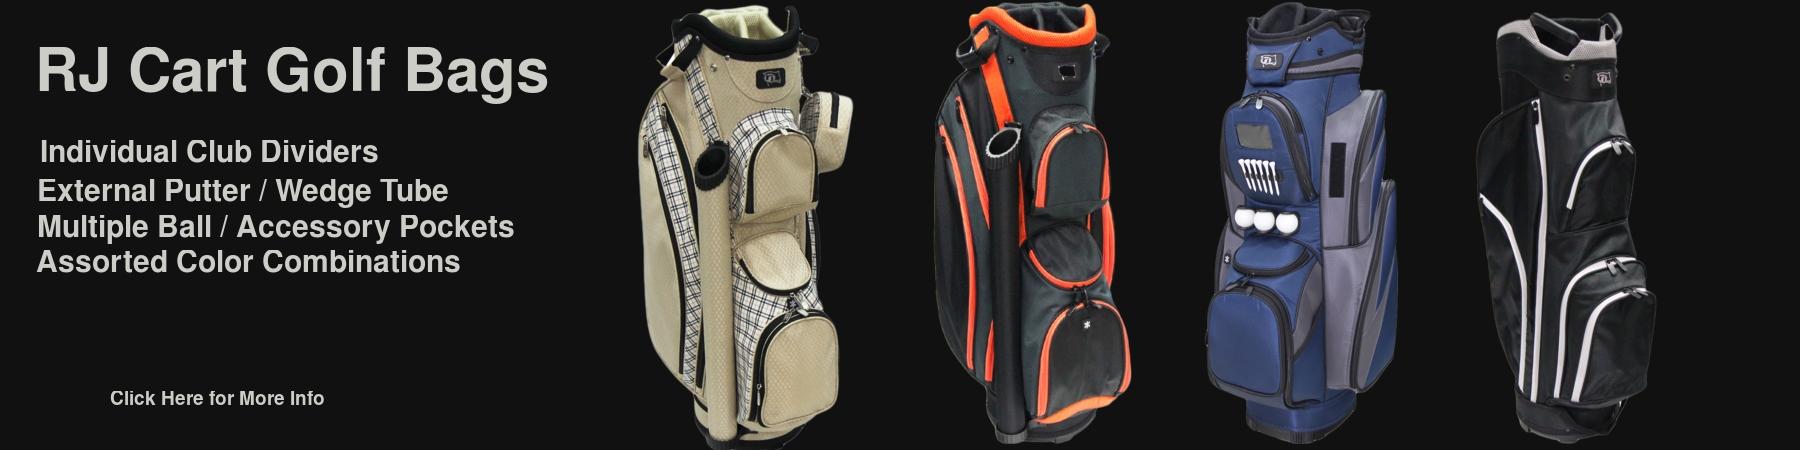 RJ Cart Golf Bags